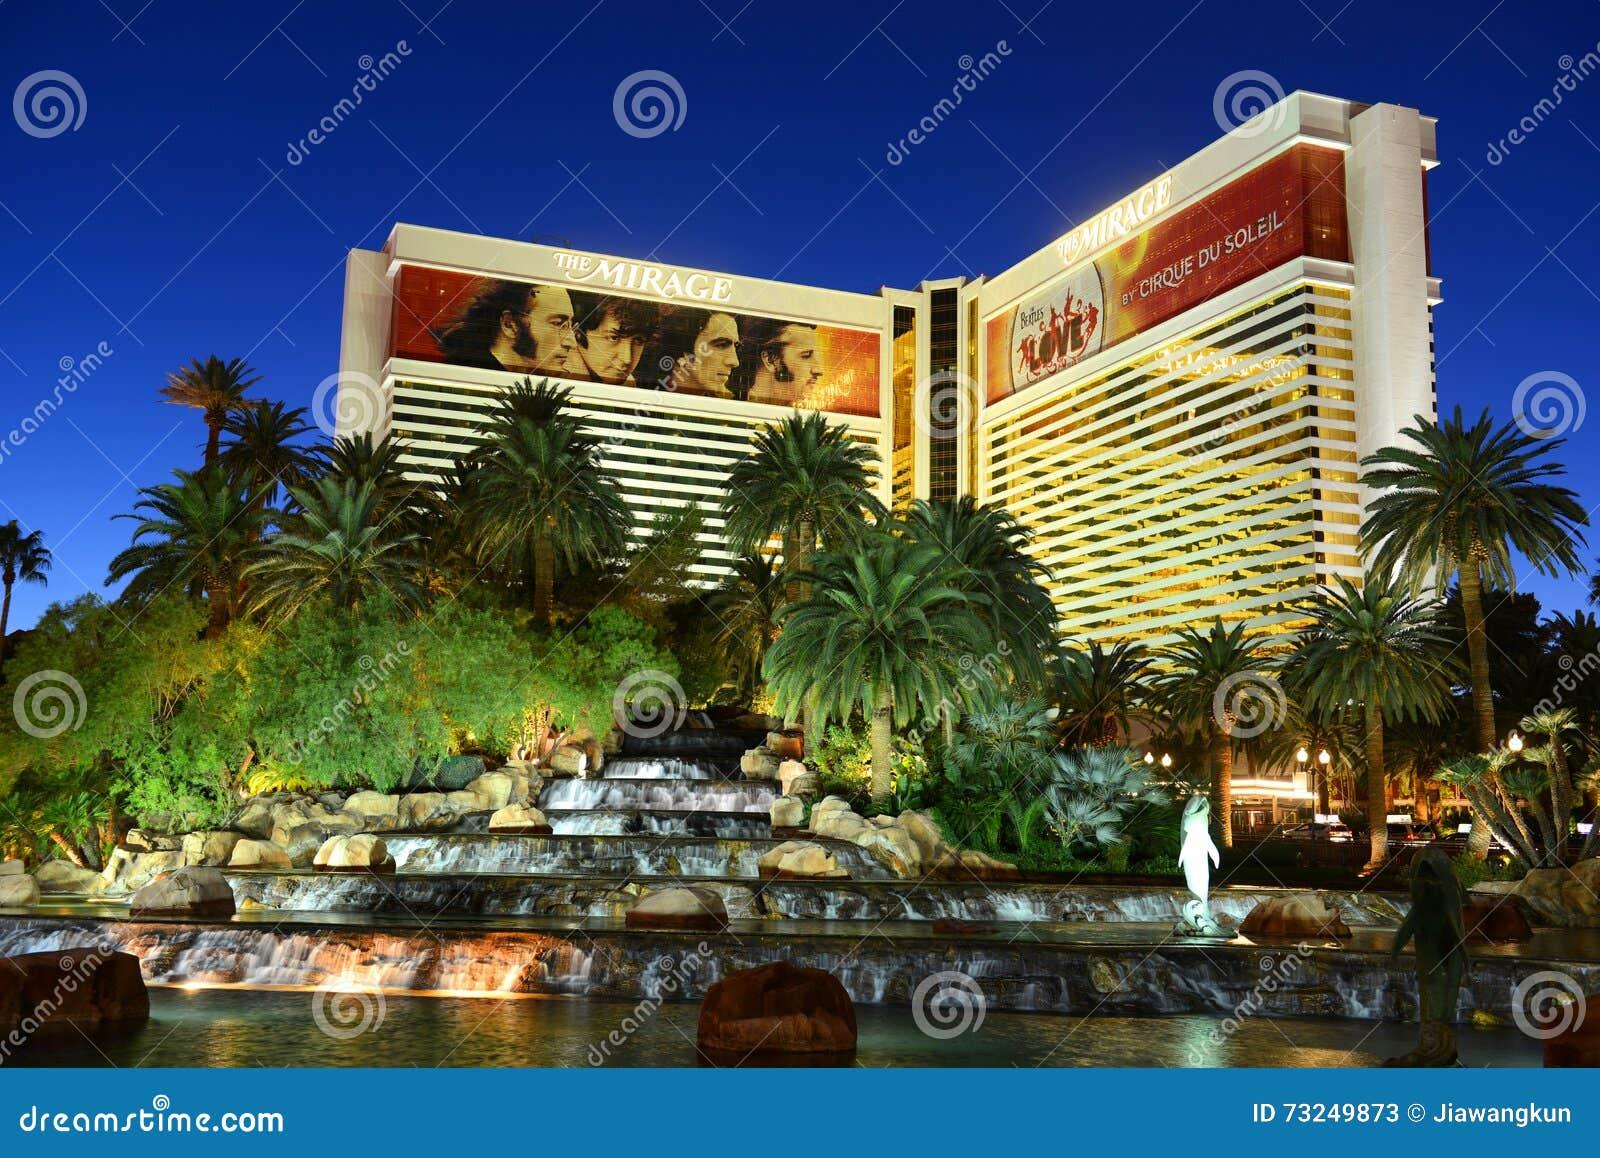 Mirage resort and casino las vegas